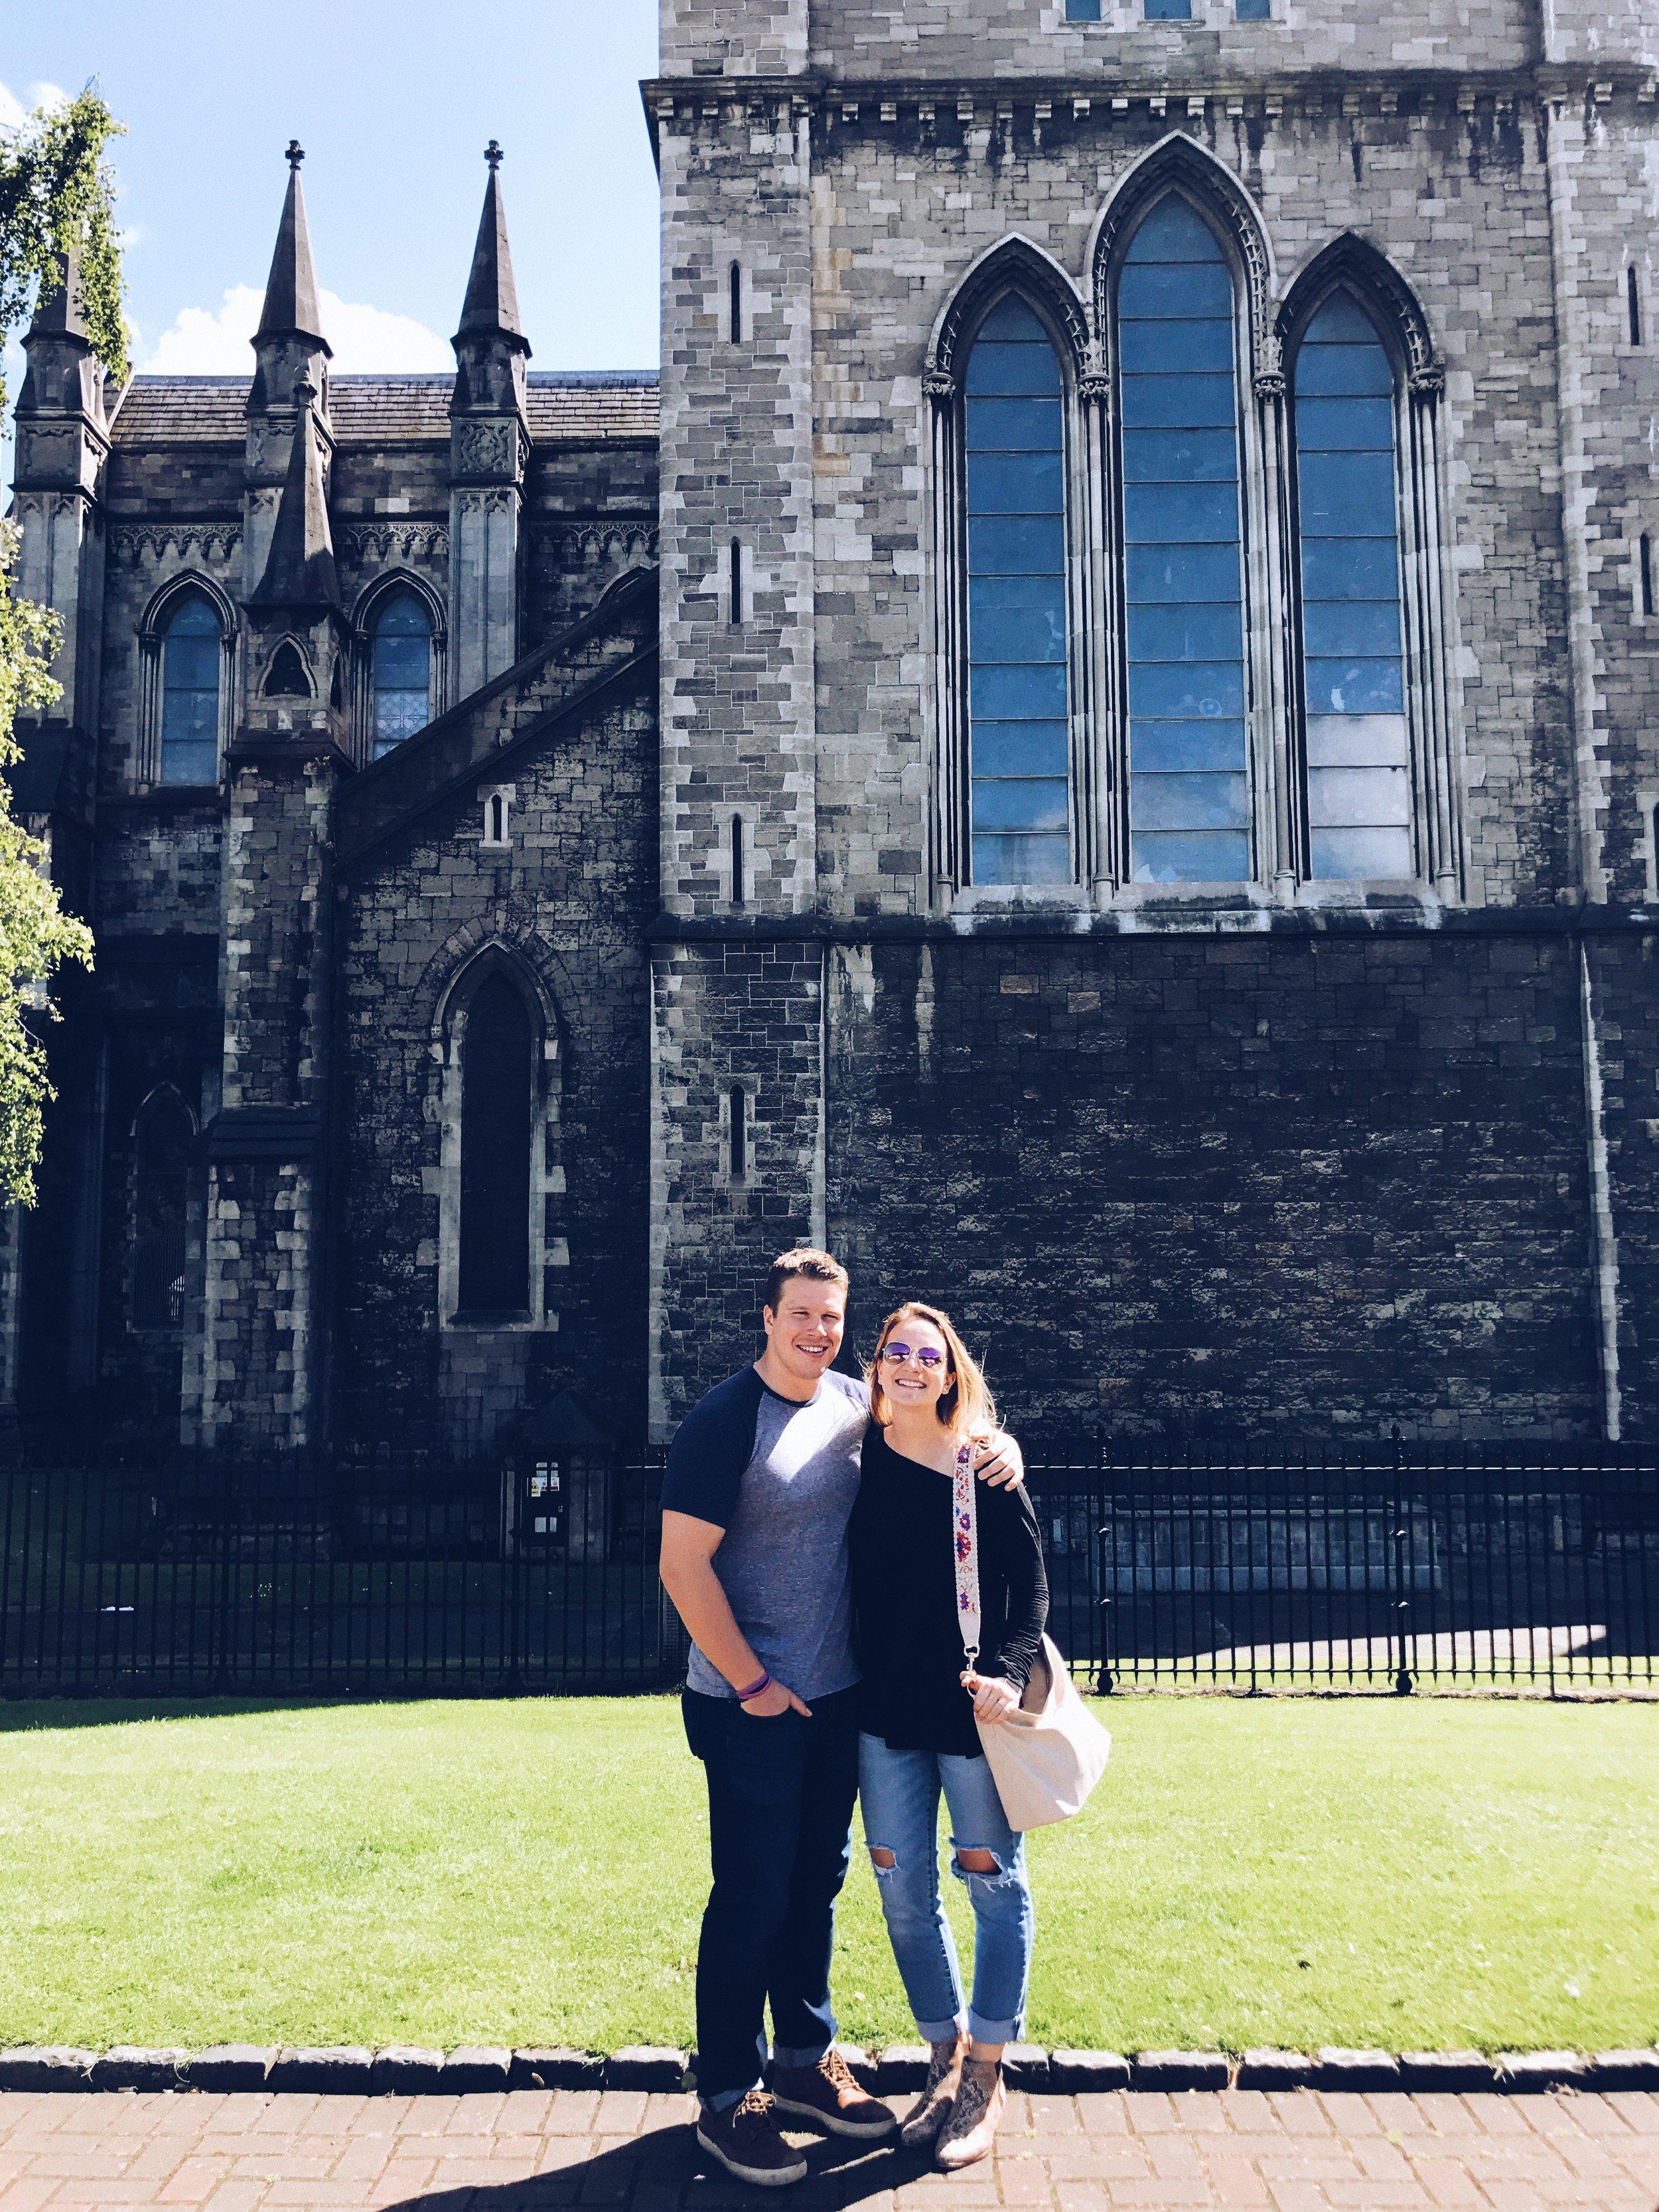 Ireland Travel Guide Dublin